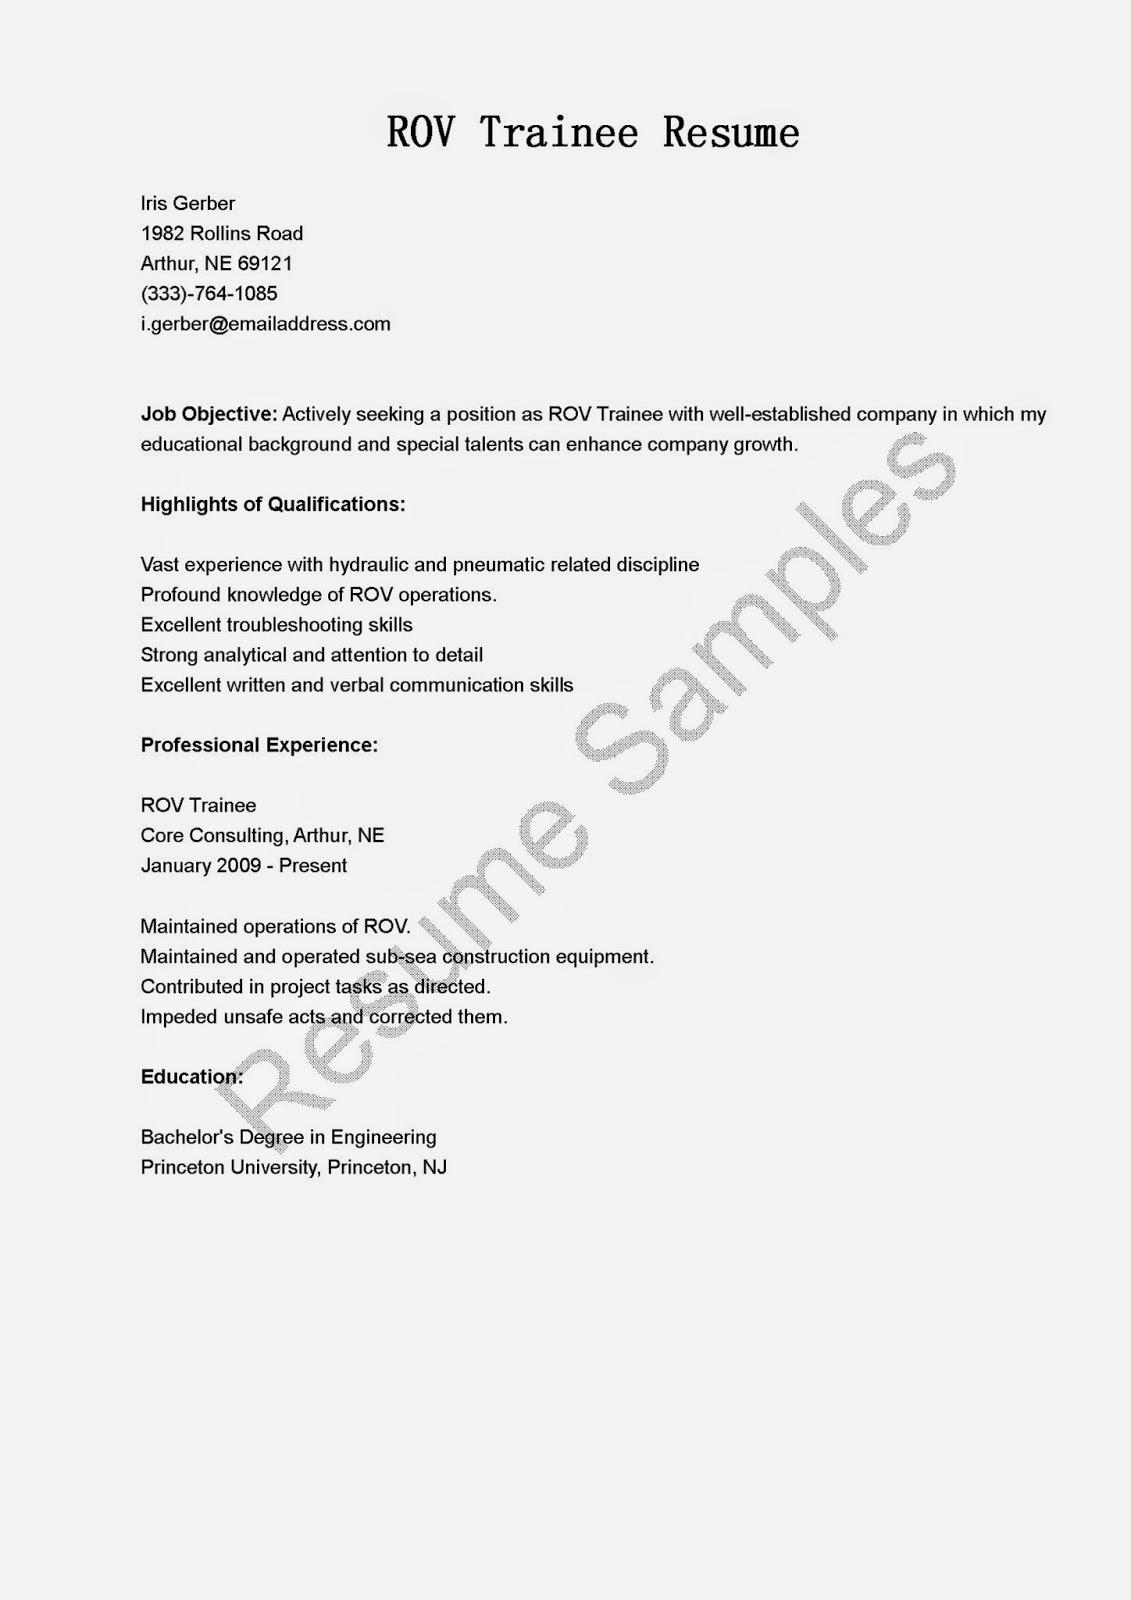 resume samples  rov trainee resume sample